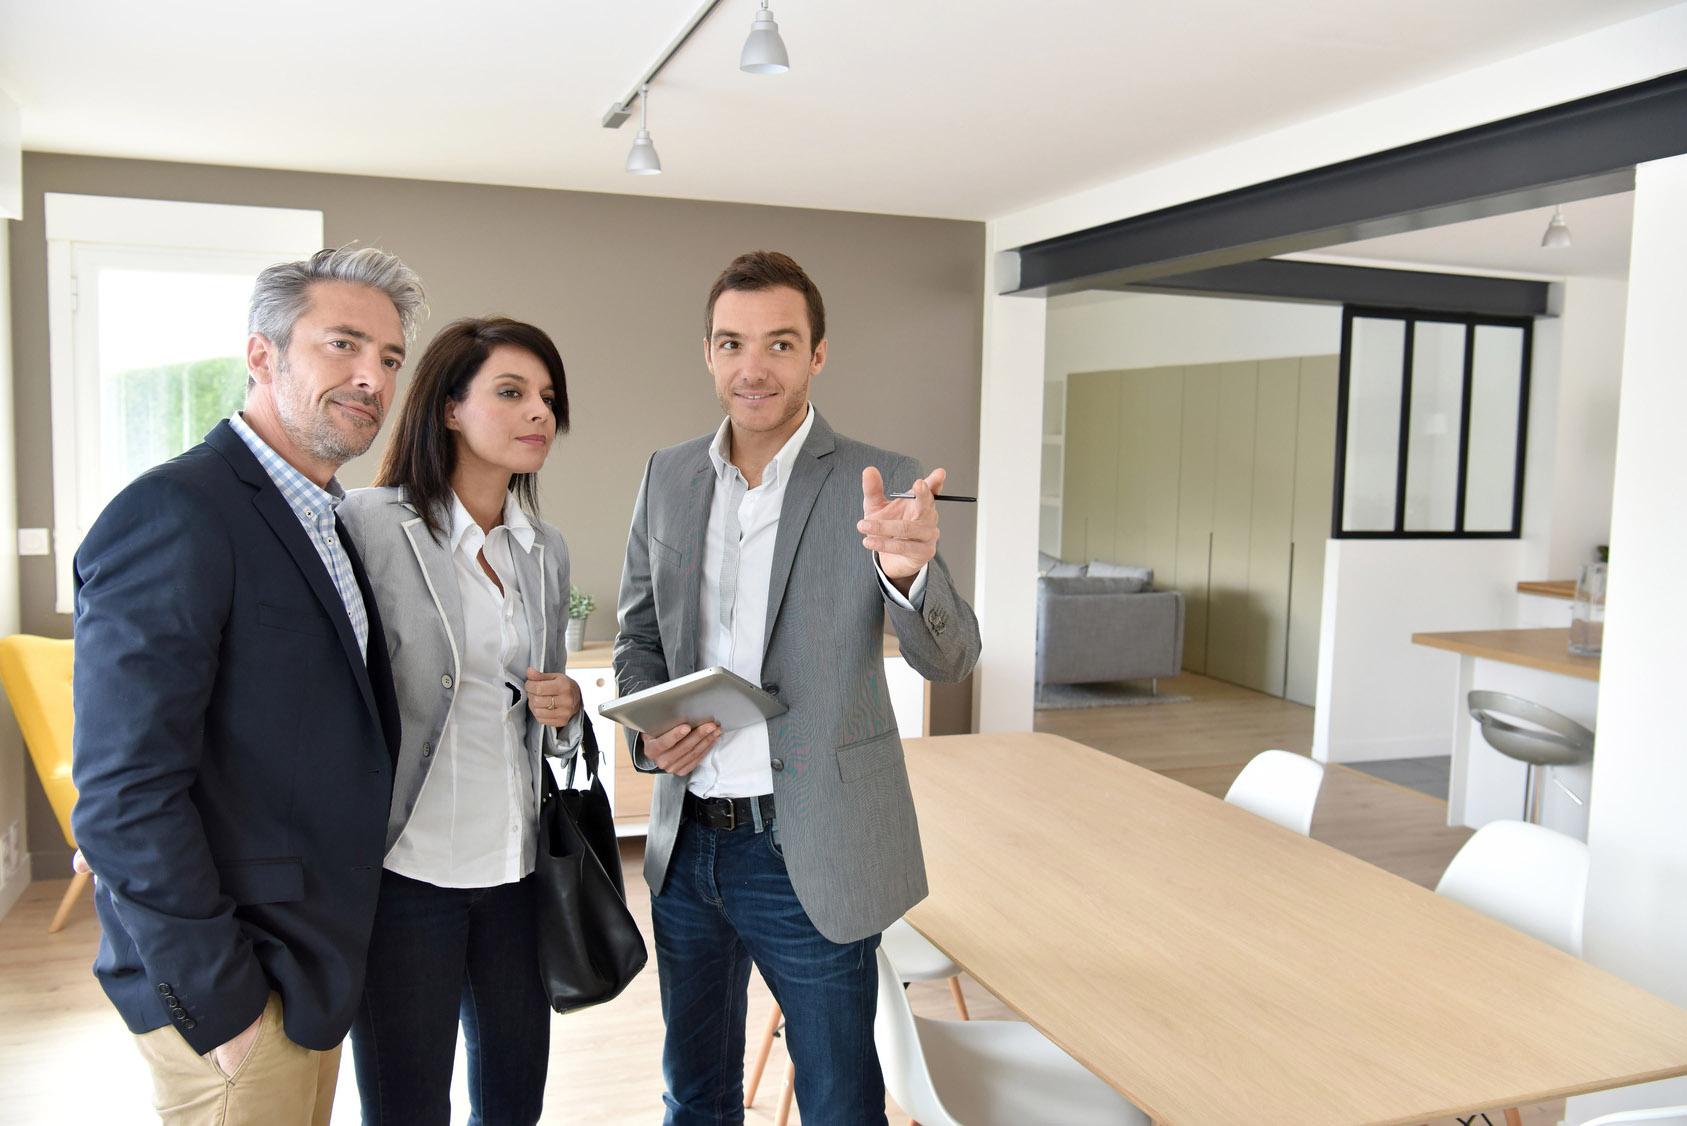 Agent immobilier agente immobili re m tier tudes for Com agent immobilier